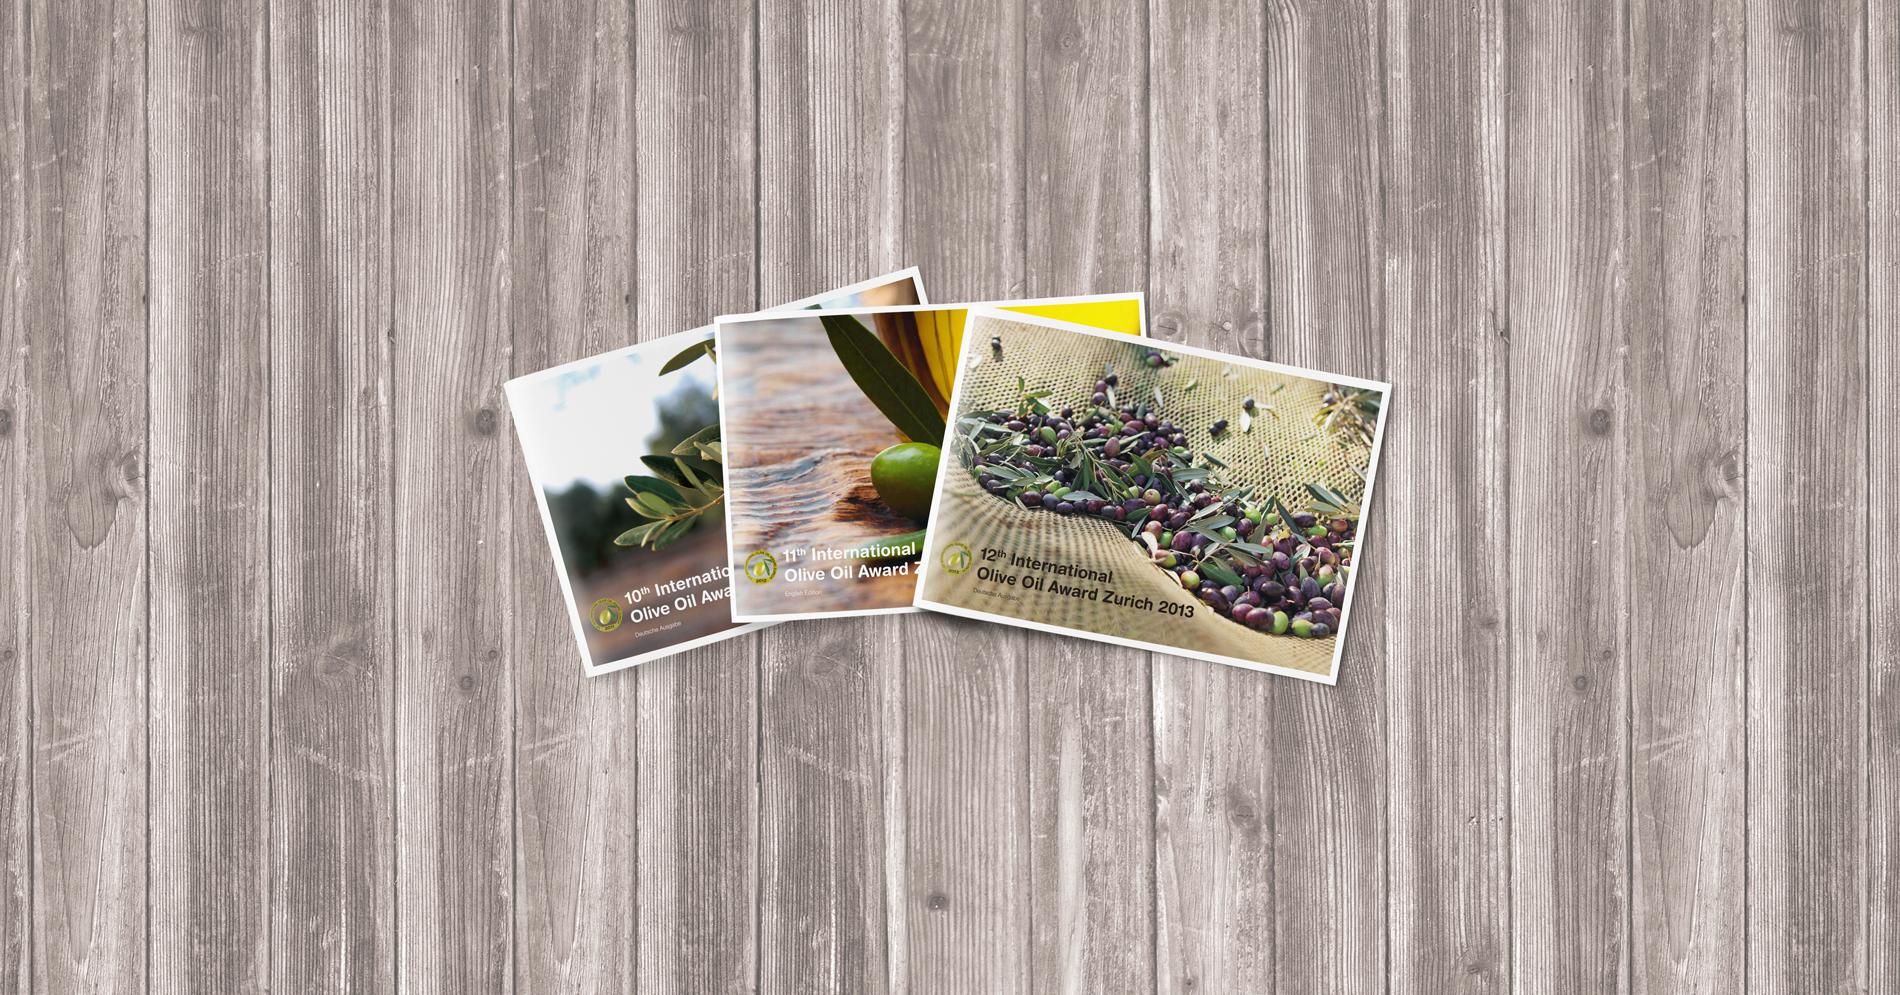 Booklet Broschüre Corporate Publishing Corporate Communication Grafikdesign Konzeption